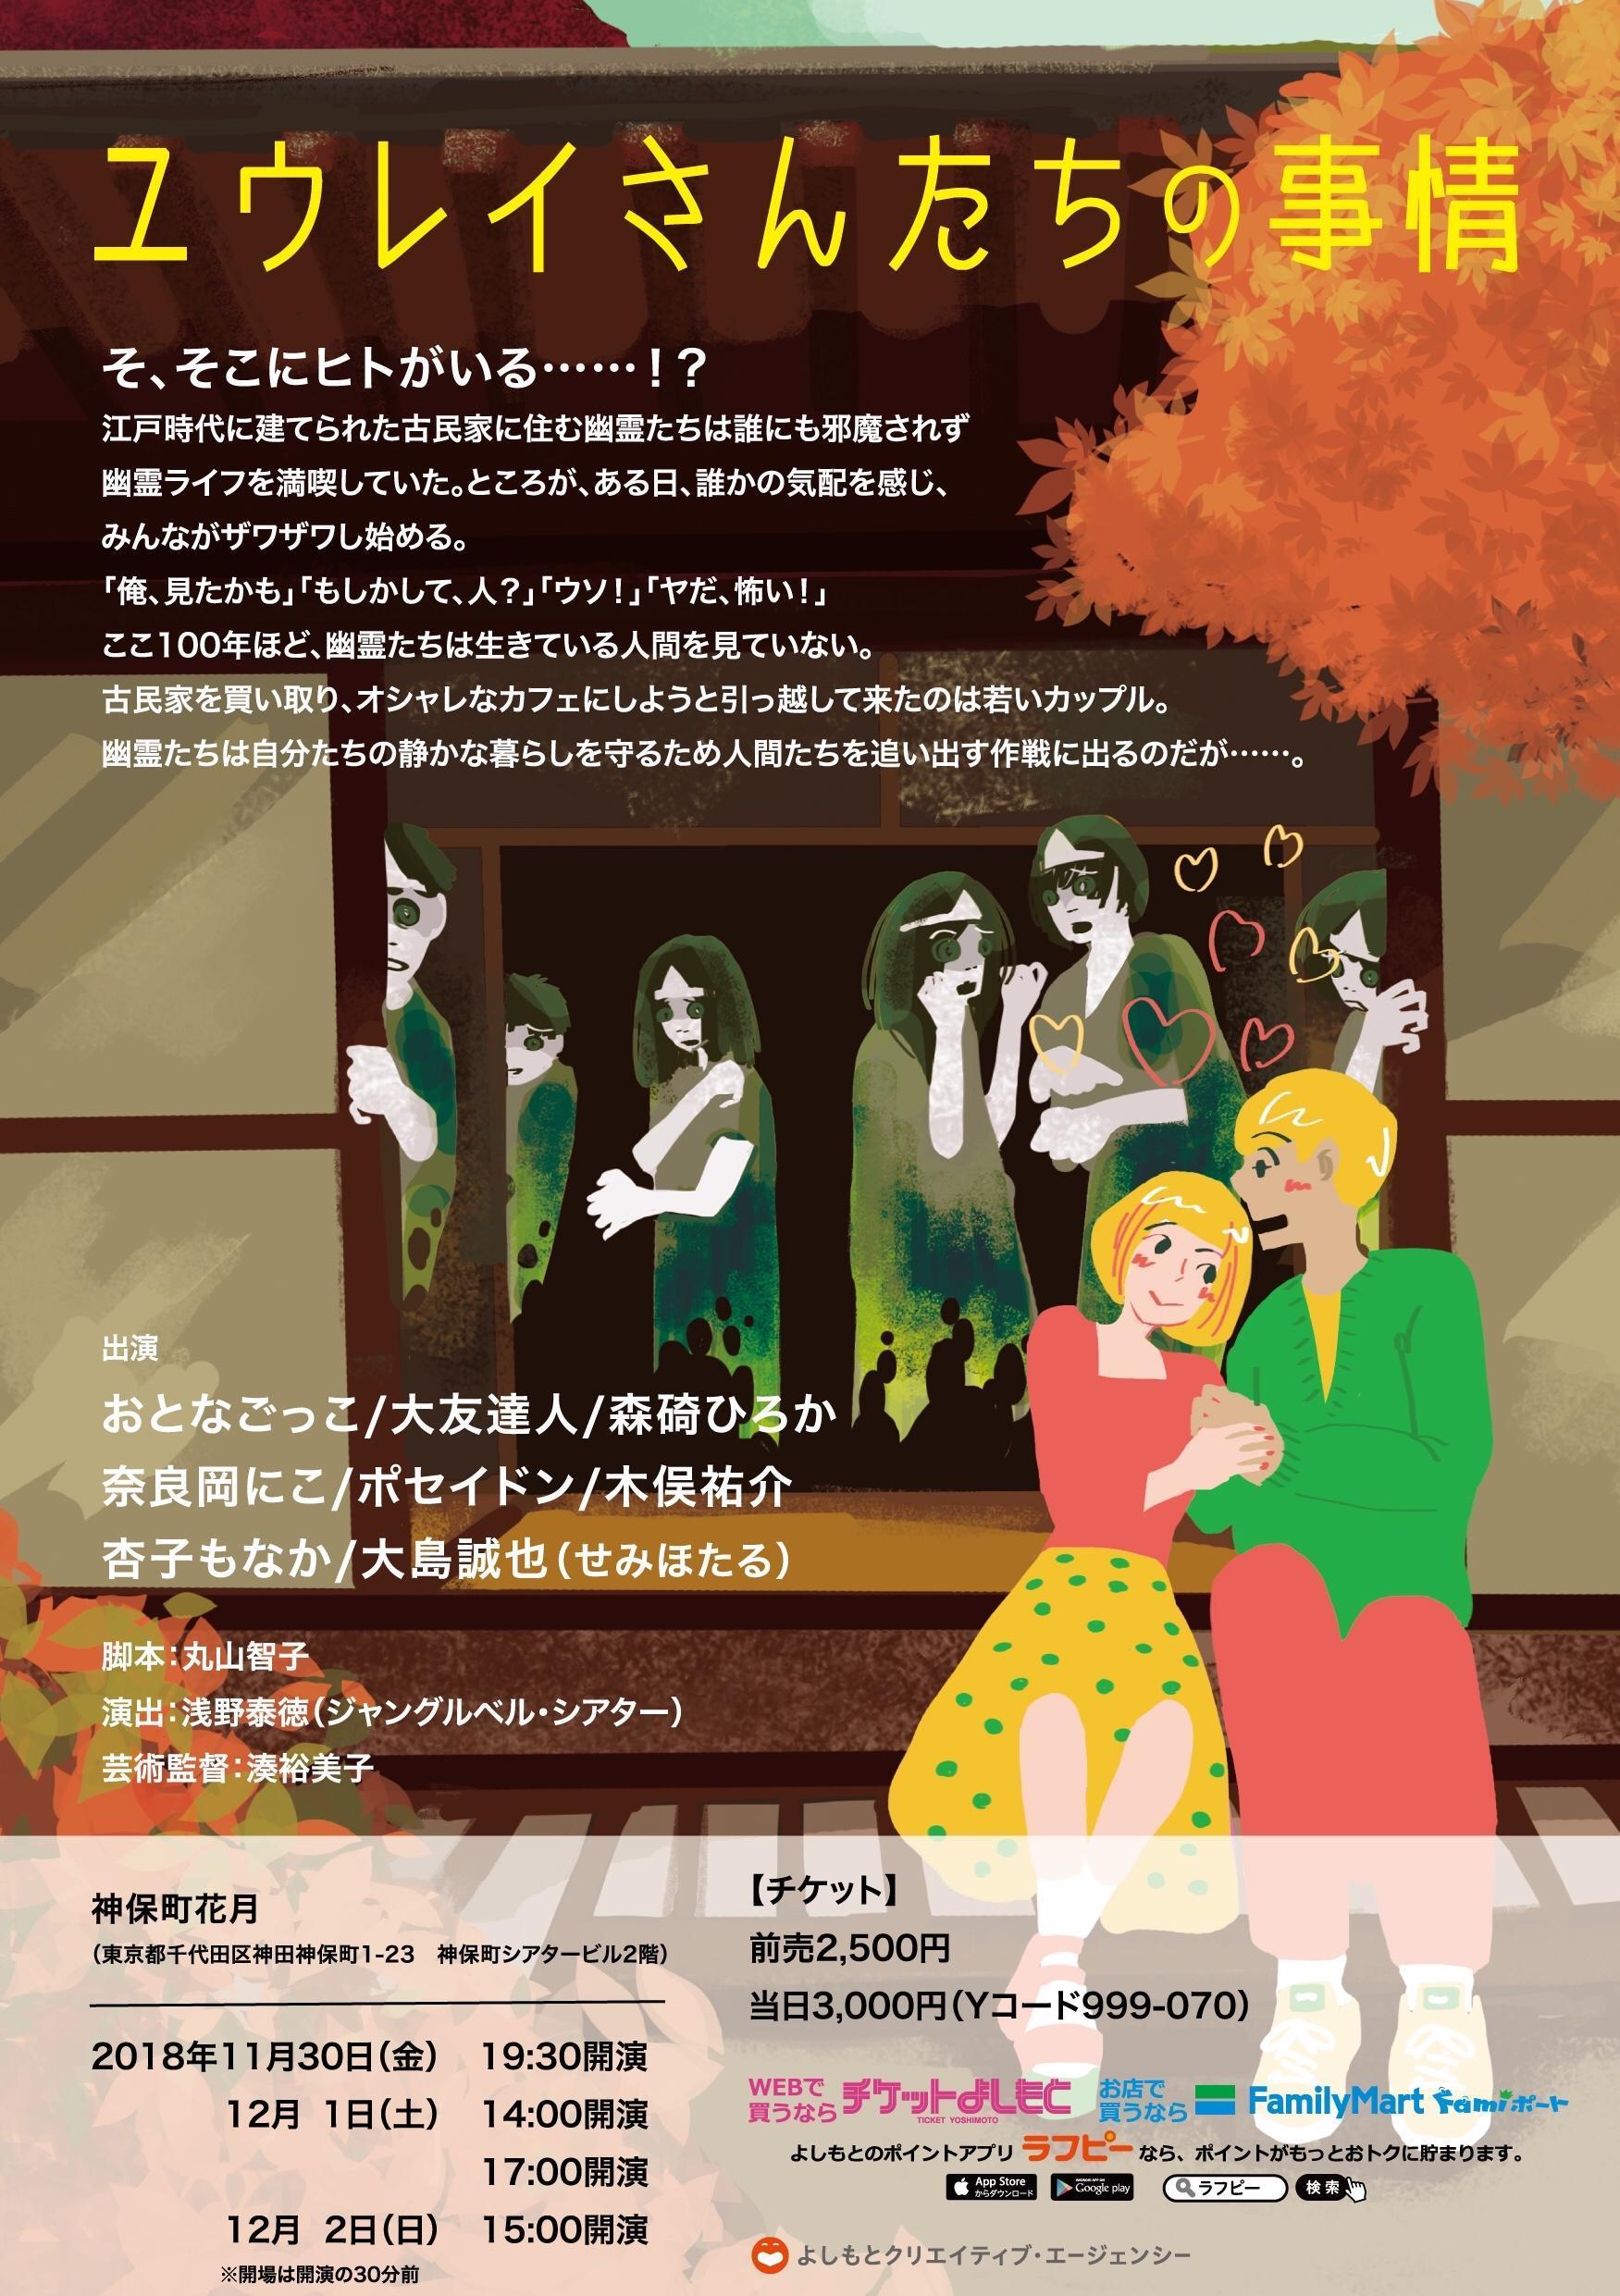 http://news.yoshimoto.co.jp/20181127120523-4afa65f48562217d5cfa444f2a72fa9aeeaefc2b.jpg